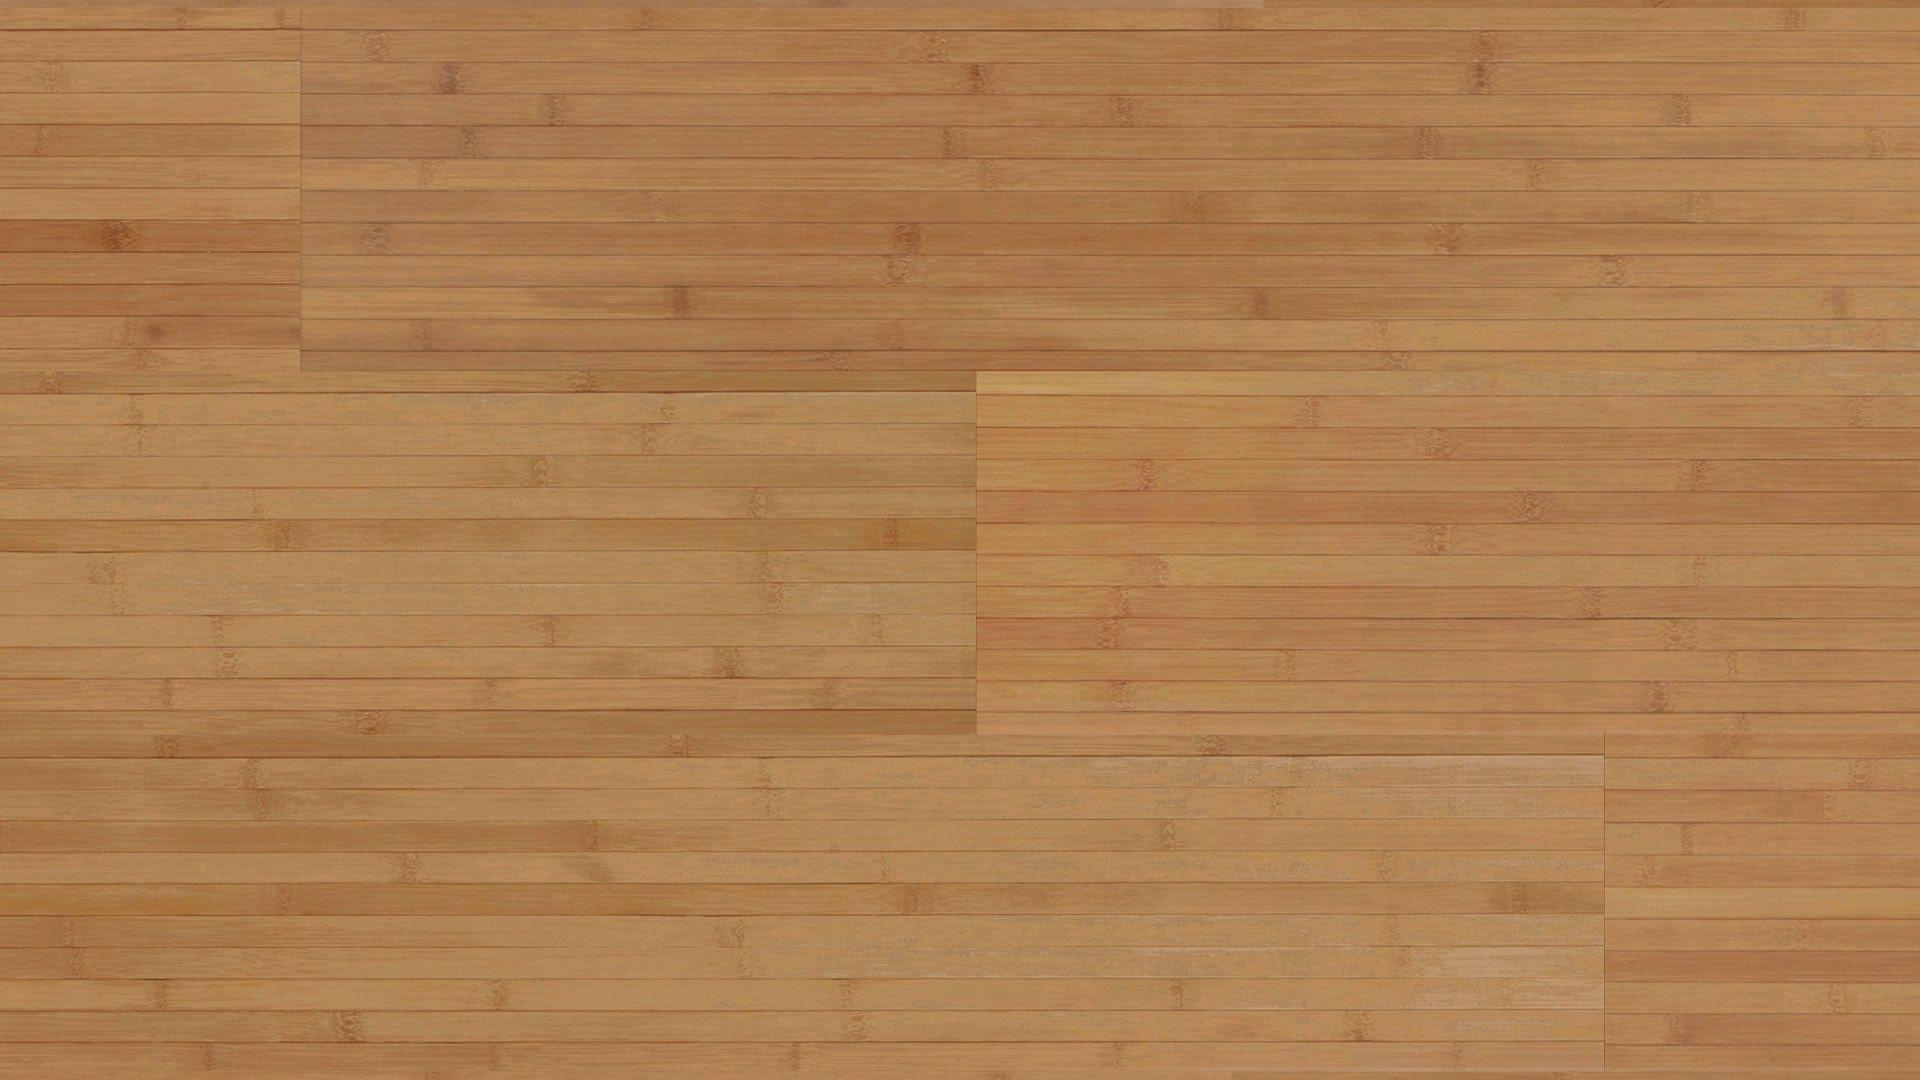 bambou tao caramel parquet bambou saint maclou. Black Bedroom Furniture Sets. Home Design Ideas